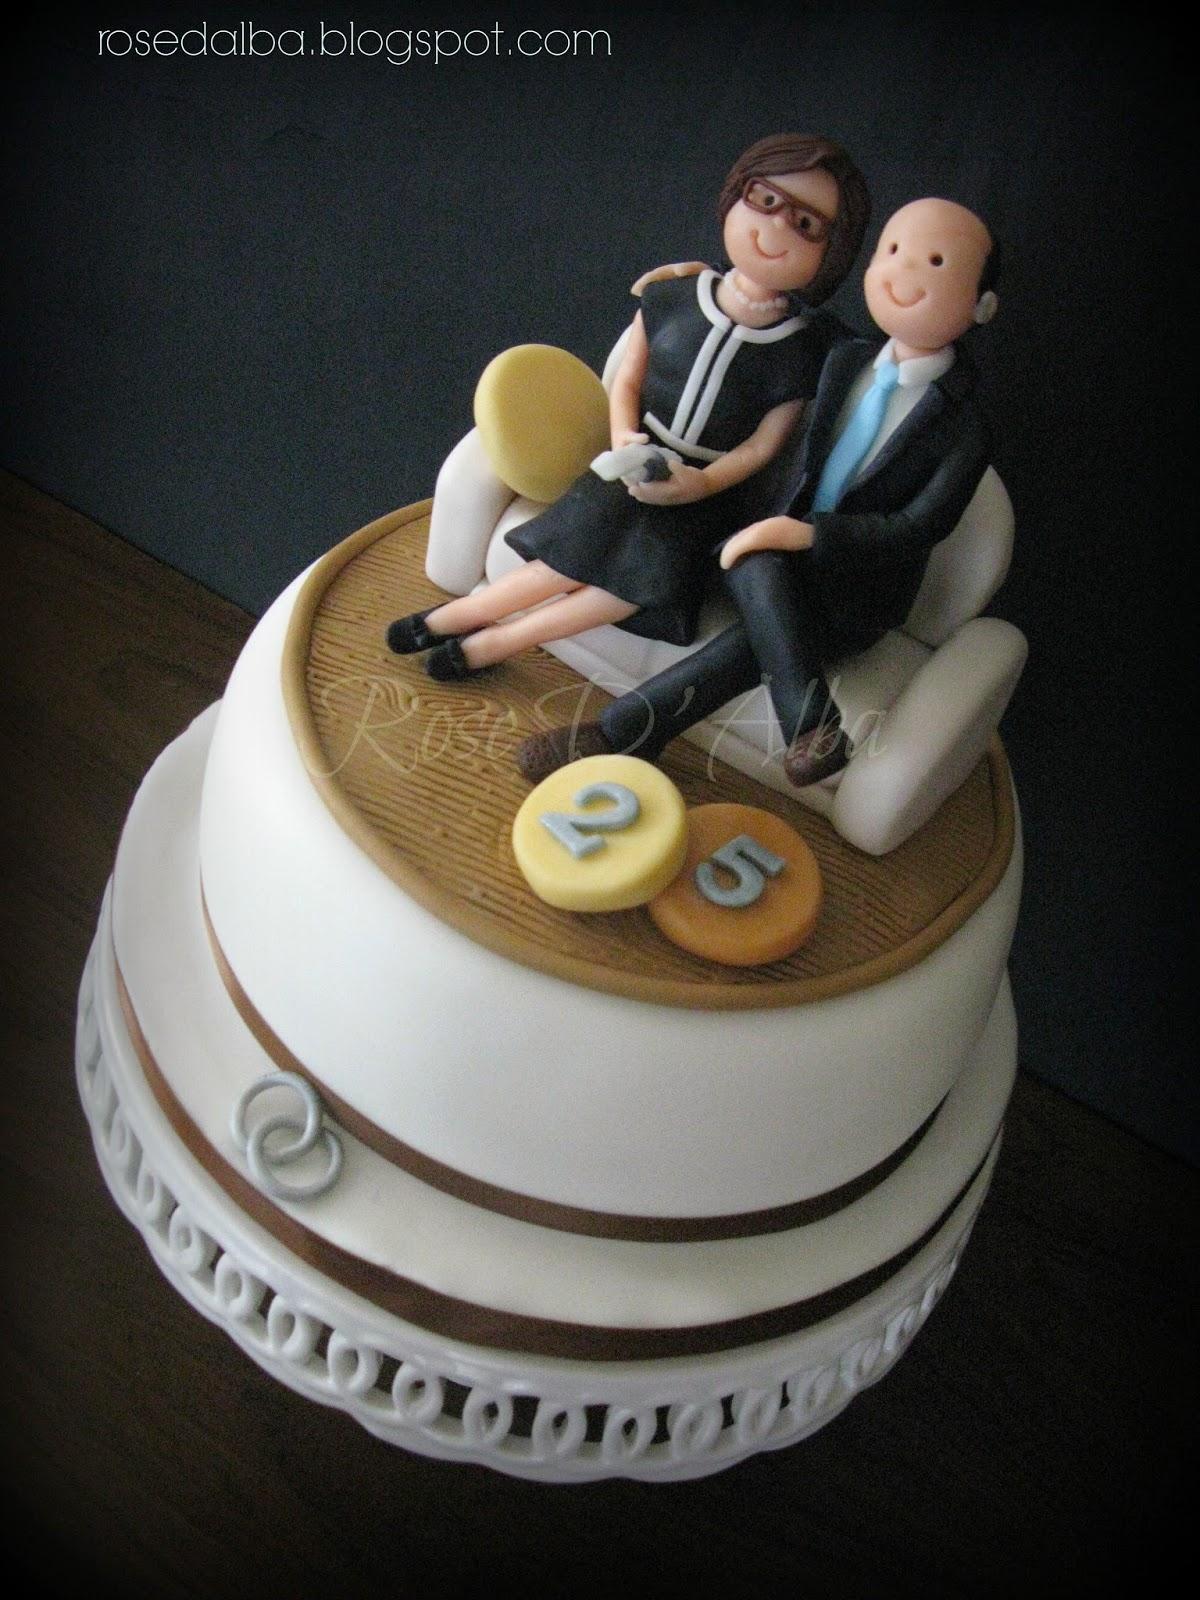 Favori ROSE D' ALBA cake designer: Una torta per i 25 anni di matrimonio  OM16